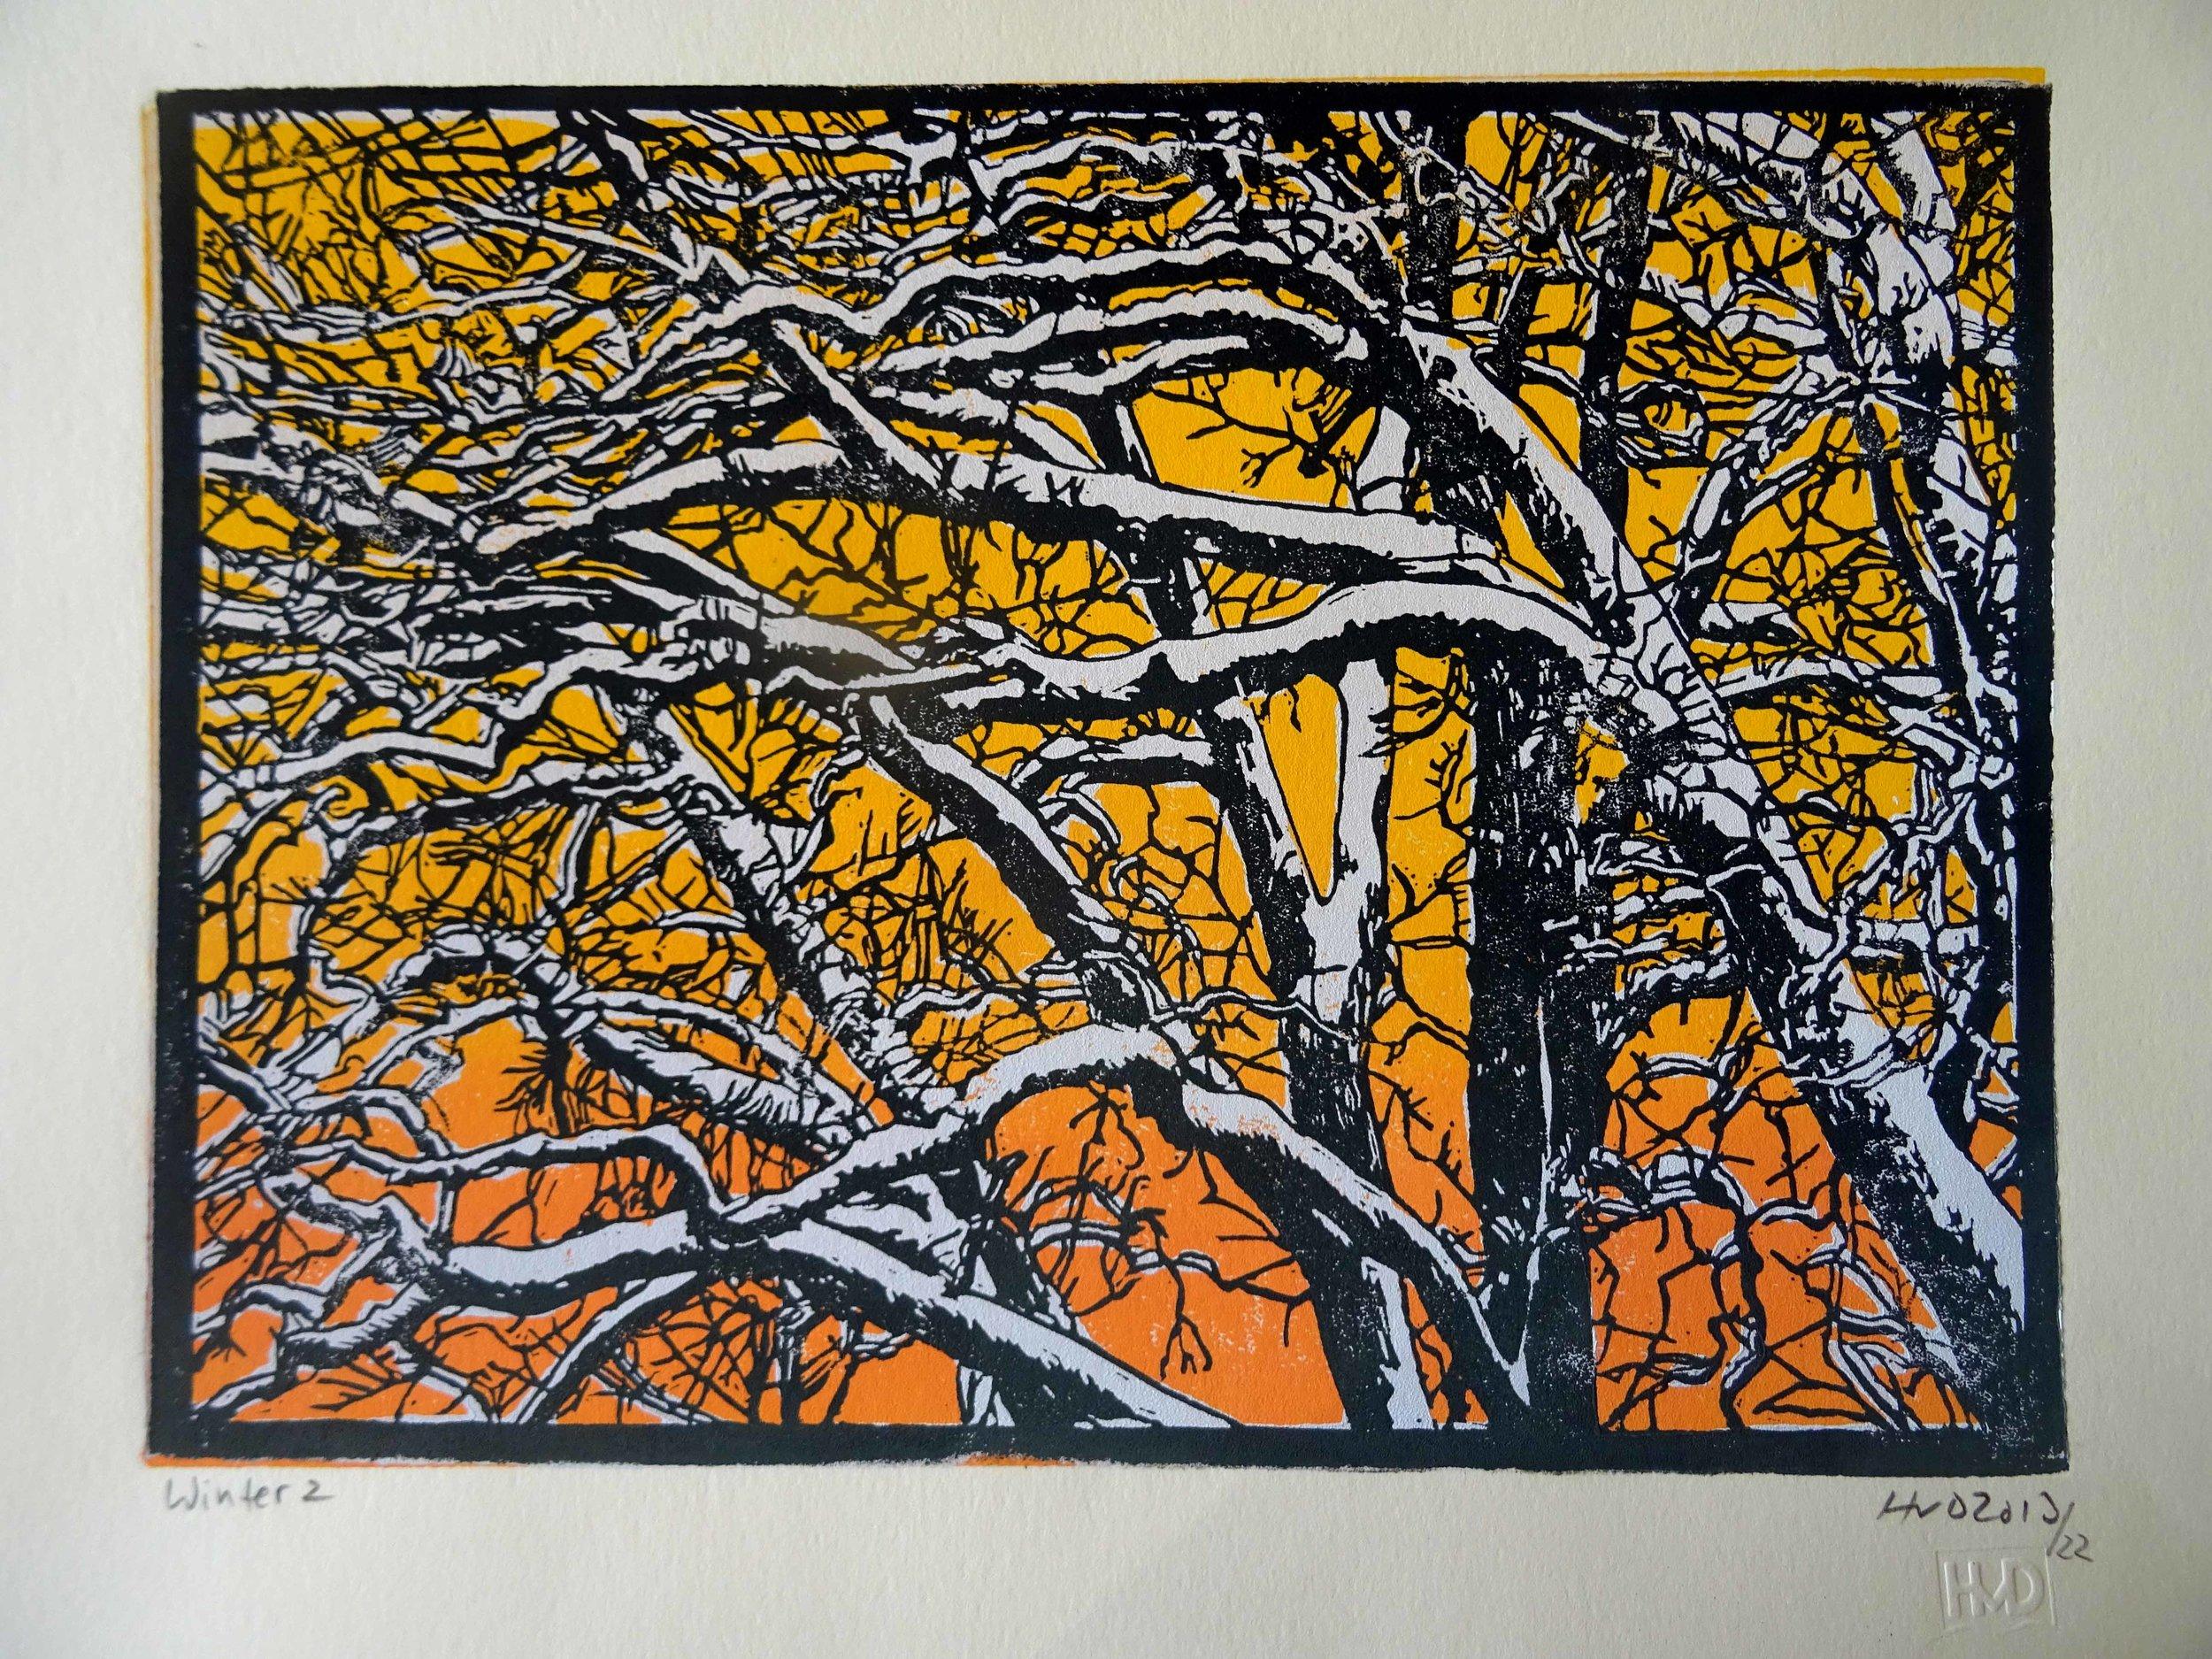 135-2, winter trees, 21x30 cm, 3-plate lino, 80 €